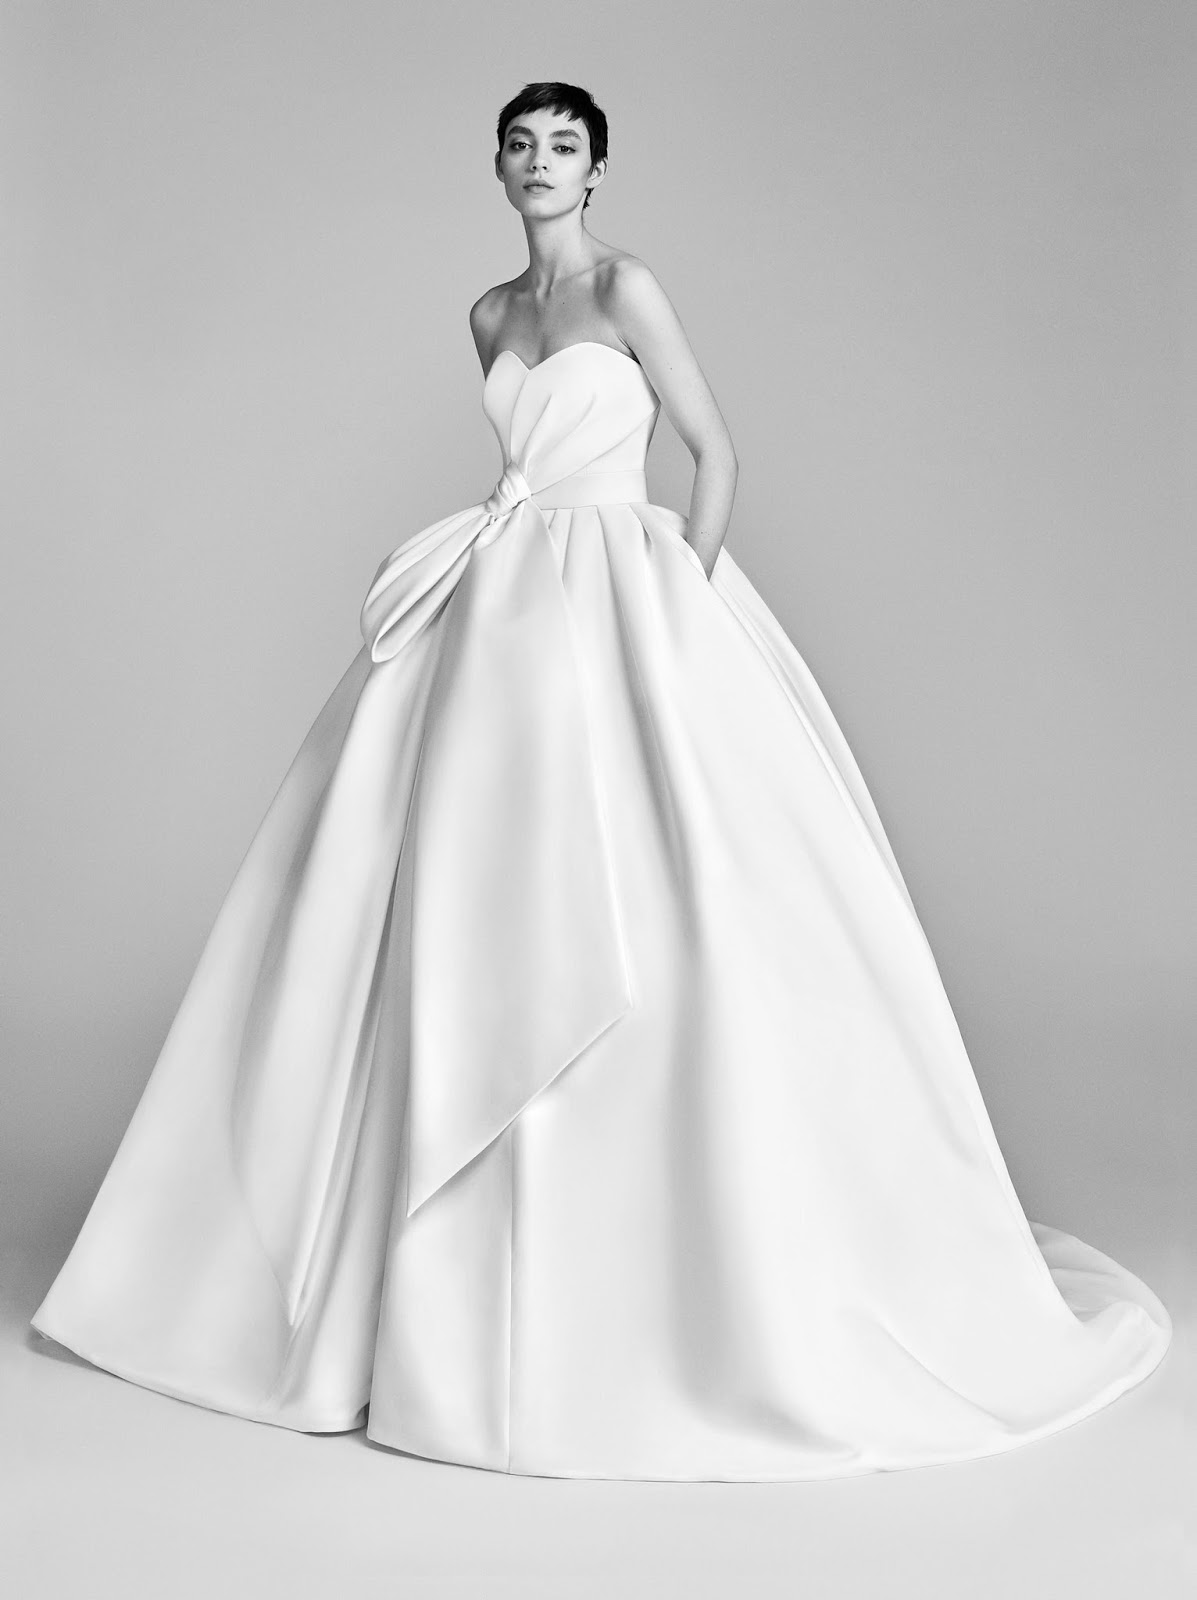 775d3c76b873 Novità dalla nyc Bridal Market - Viktor   Rolf. - Moda nozze - Forum ...